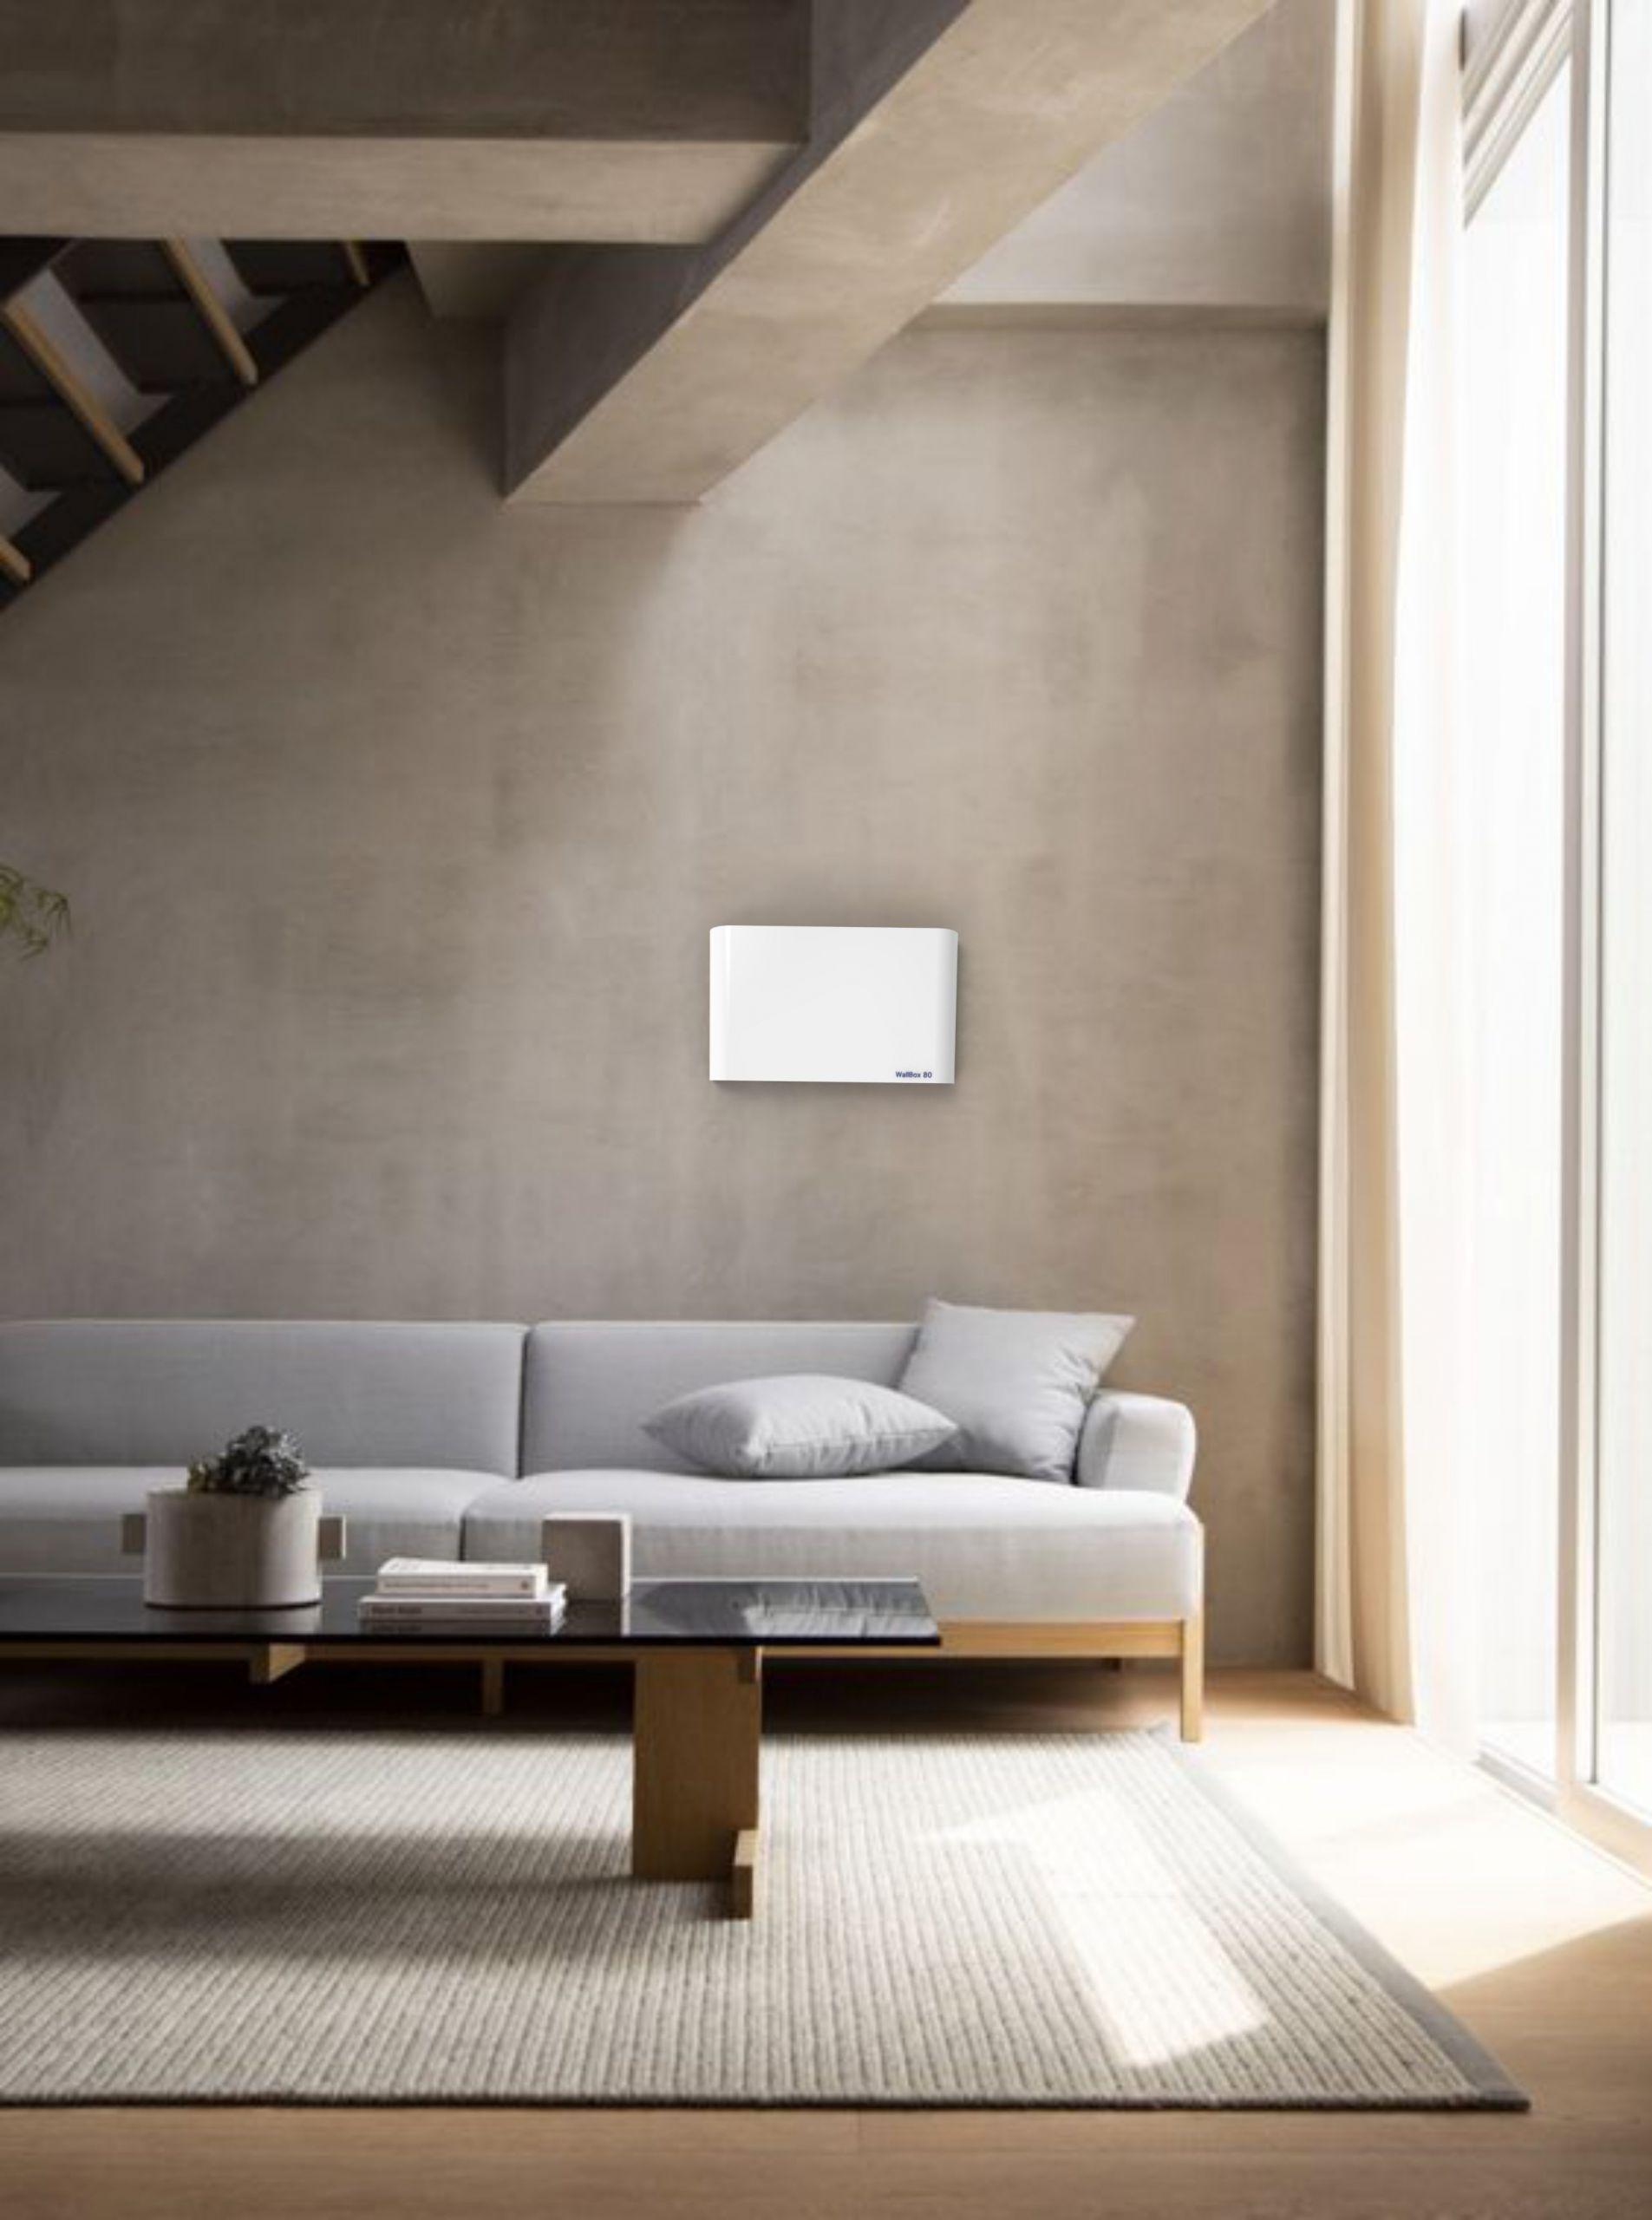 2-living-room-scaled Wallbox 80